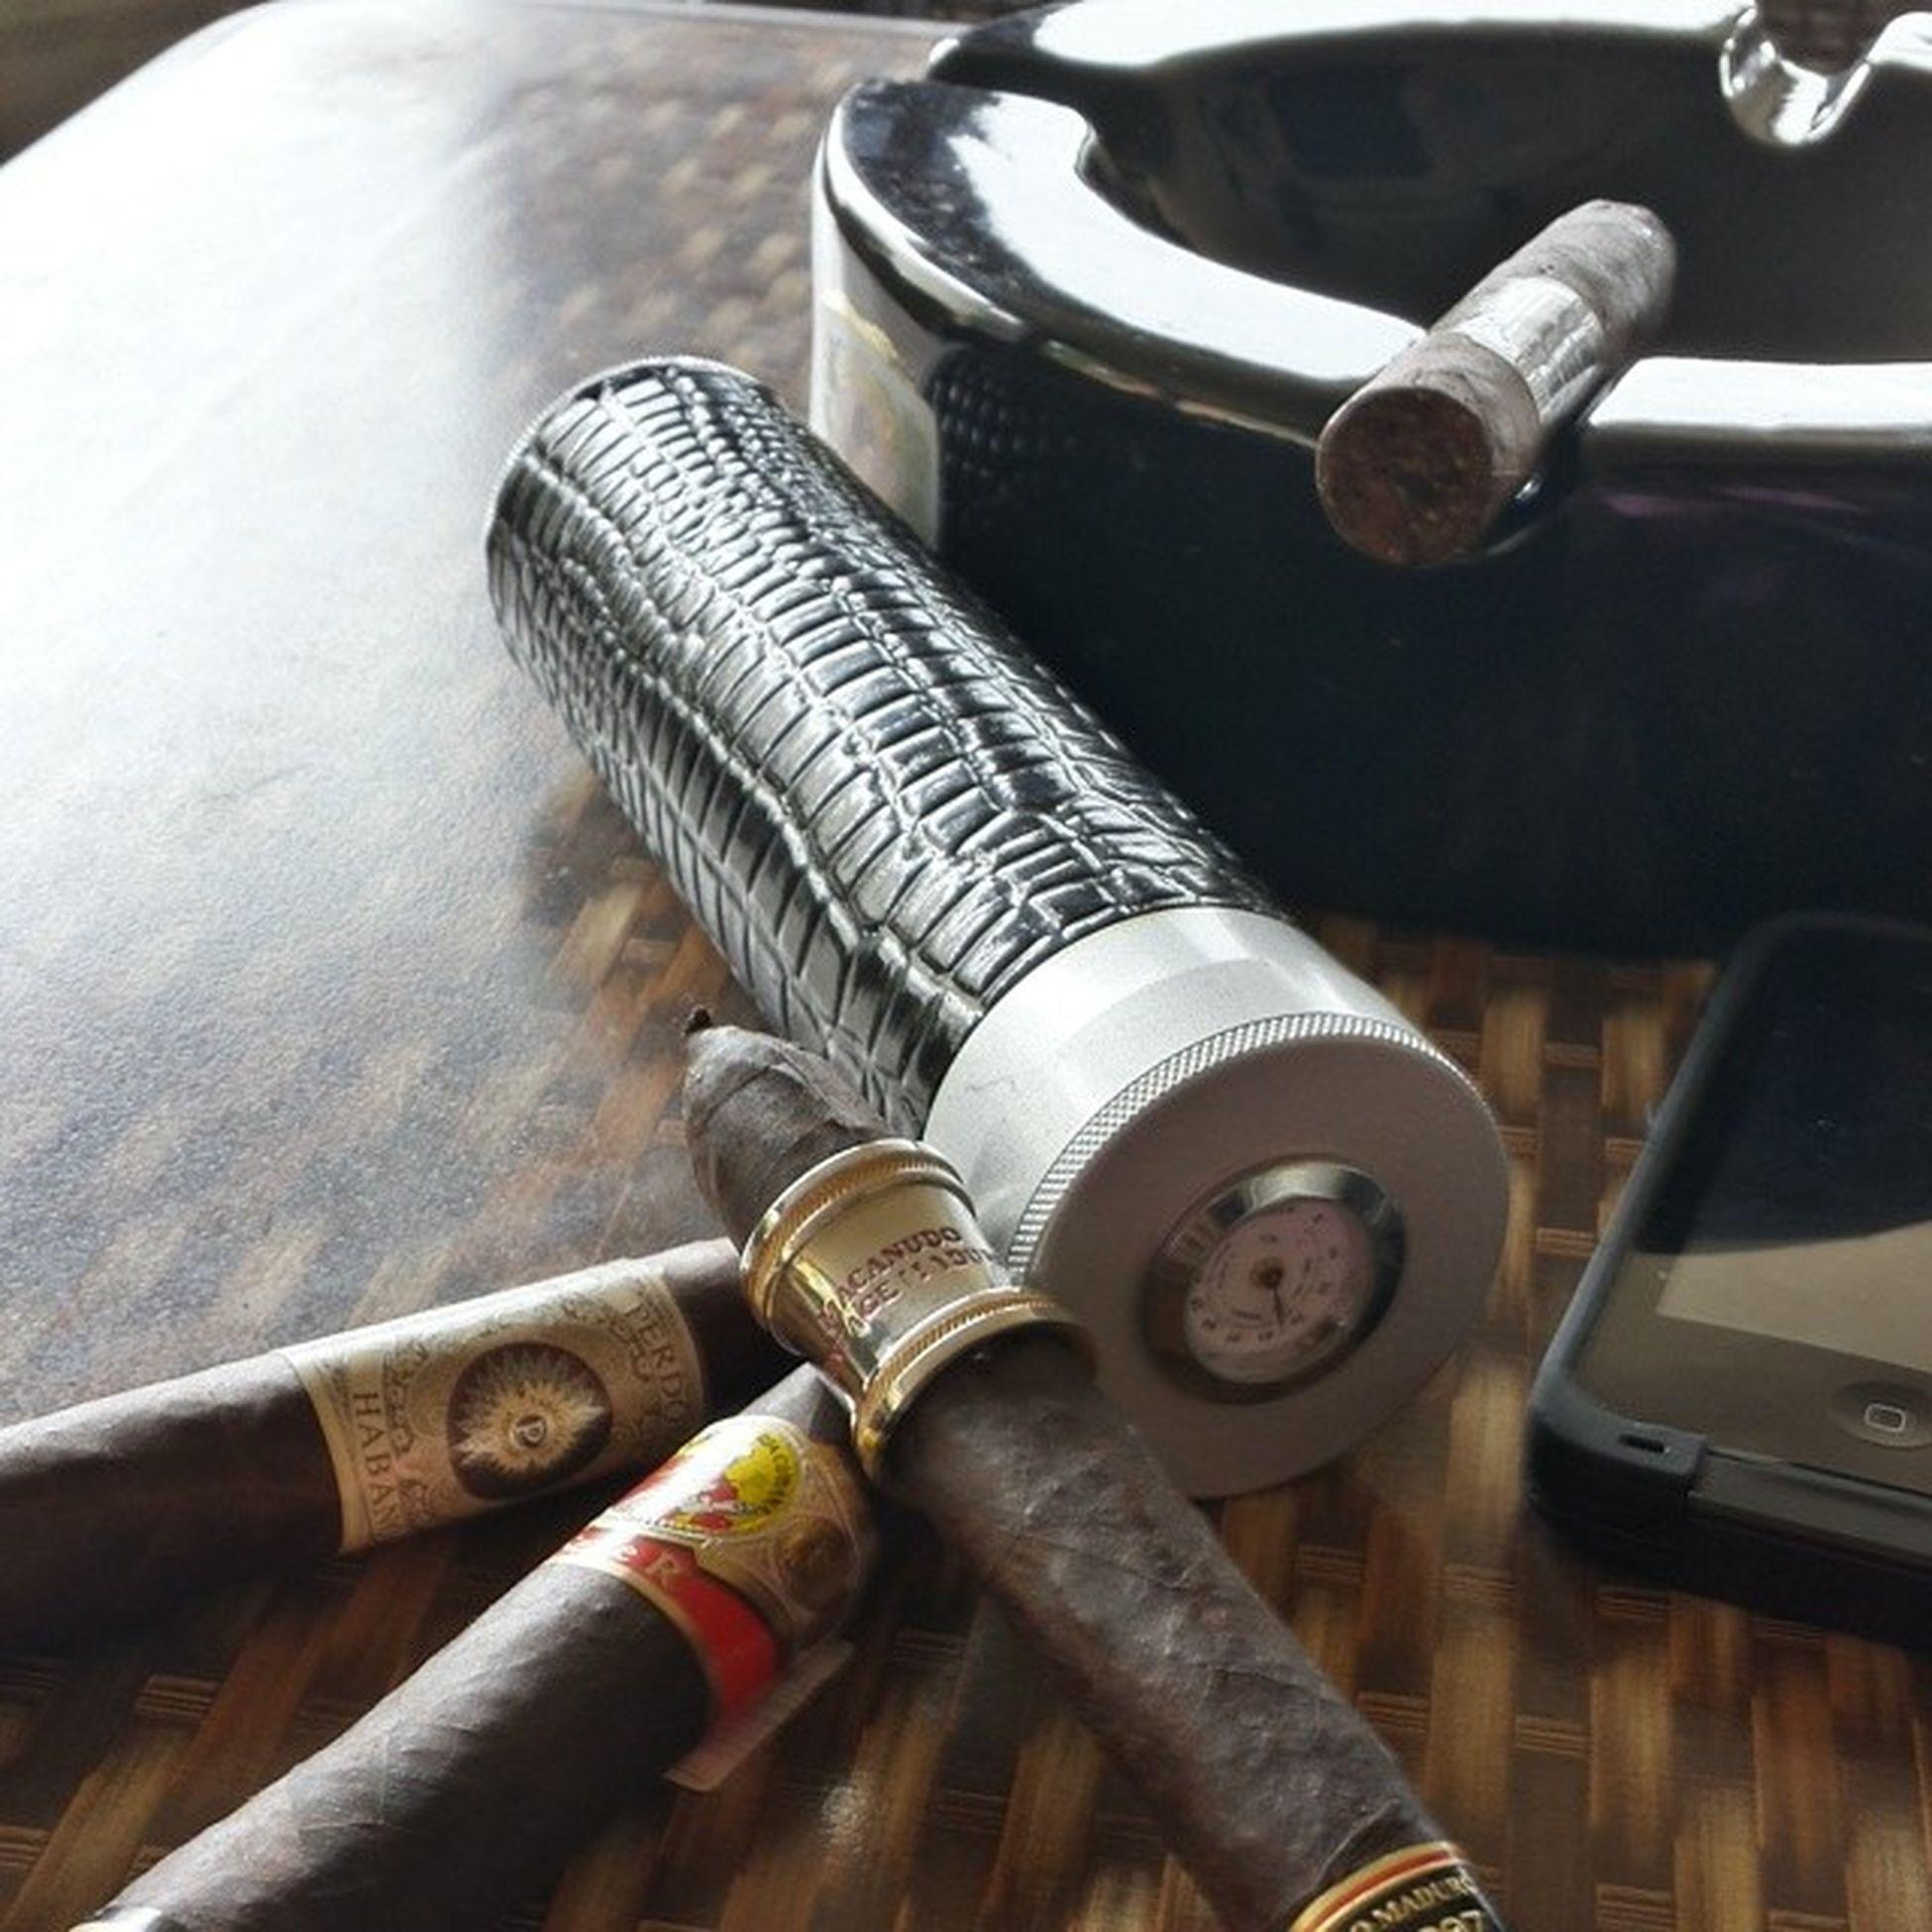 Travel essentials when im on the road Cigarmodel Cigarmodel Lagloria Rseries perdomo maduro macanudo